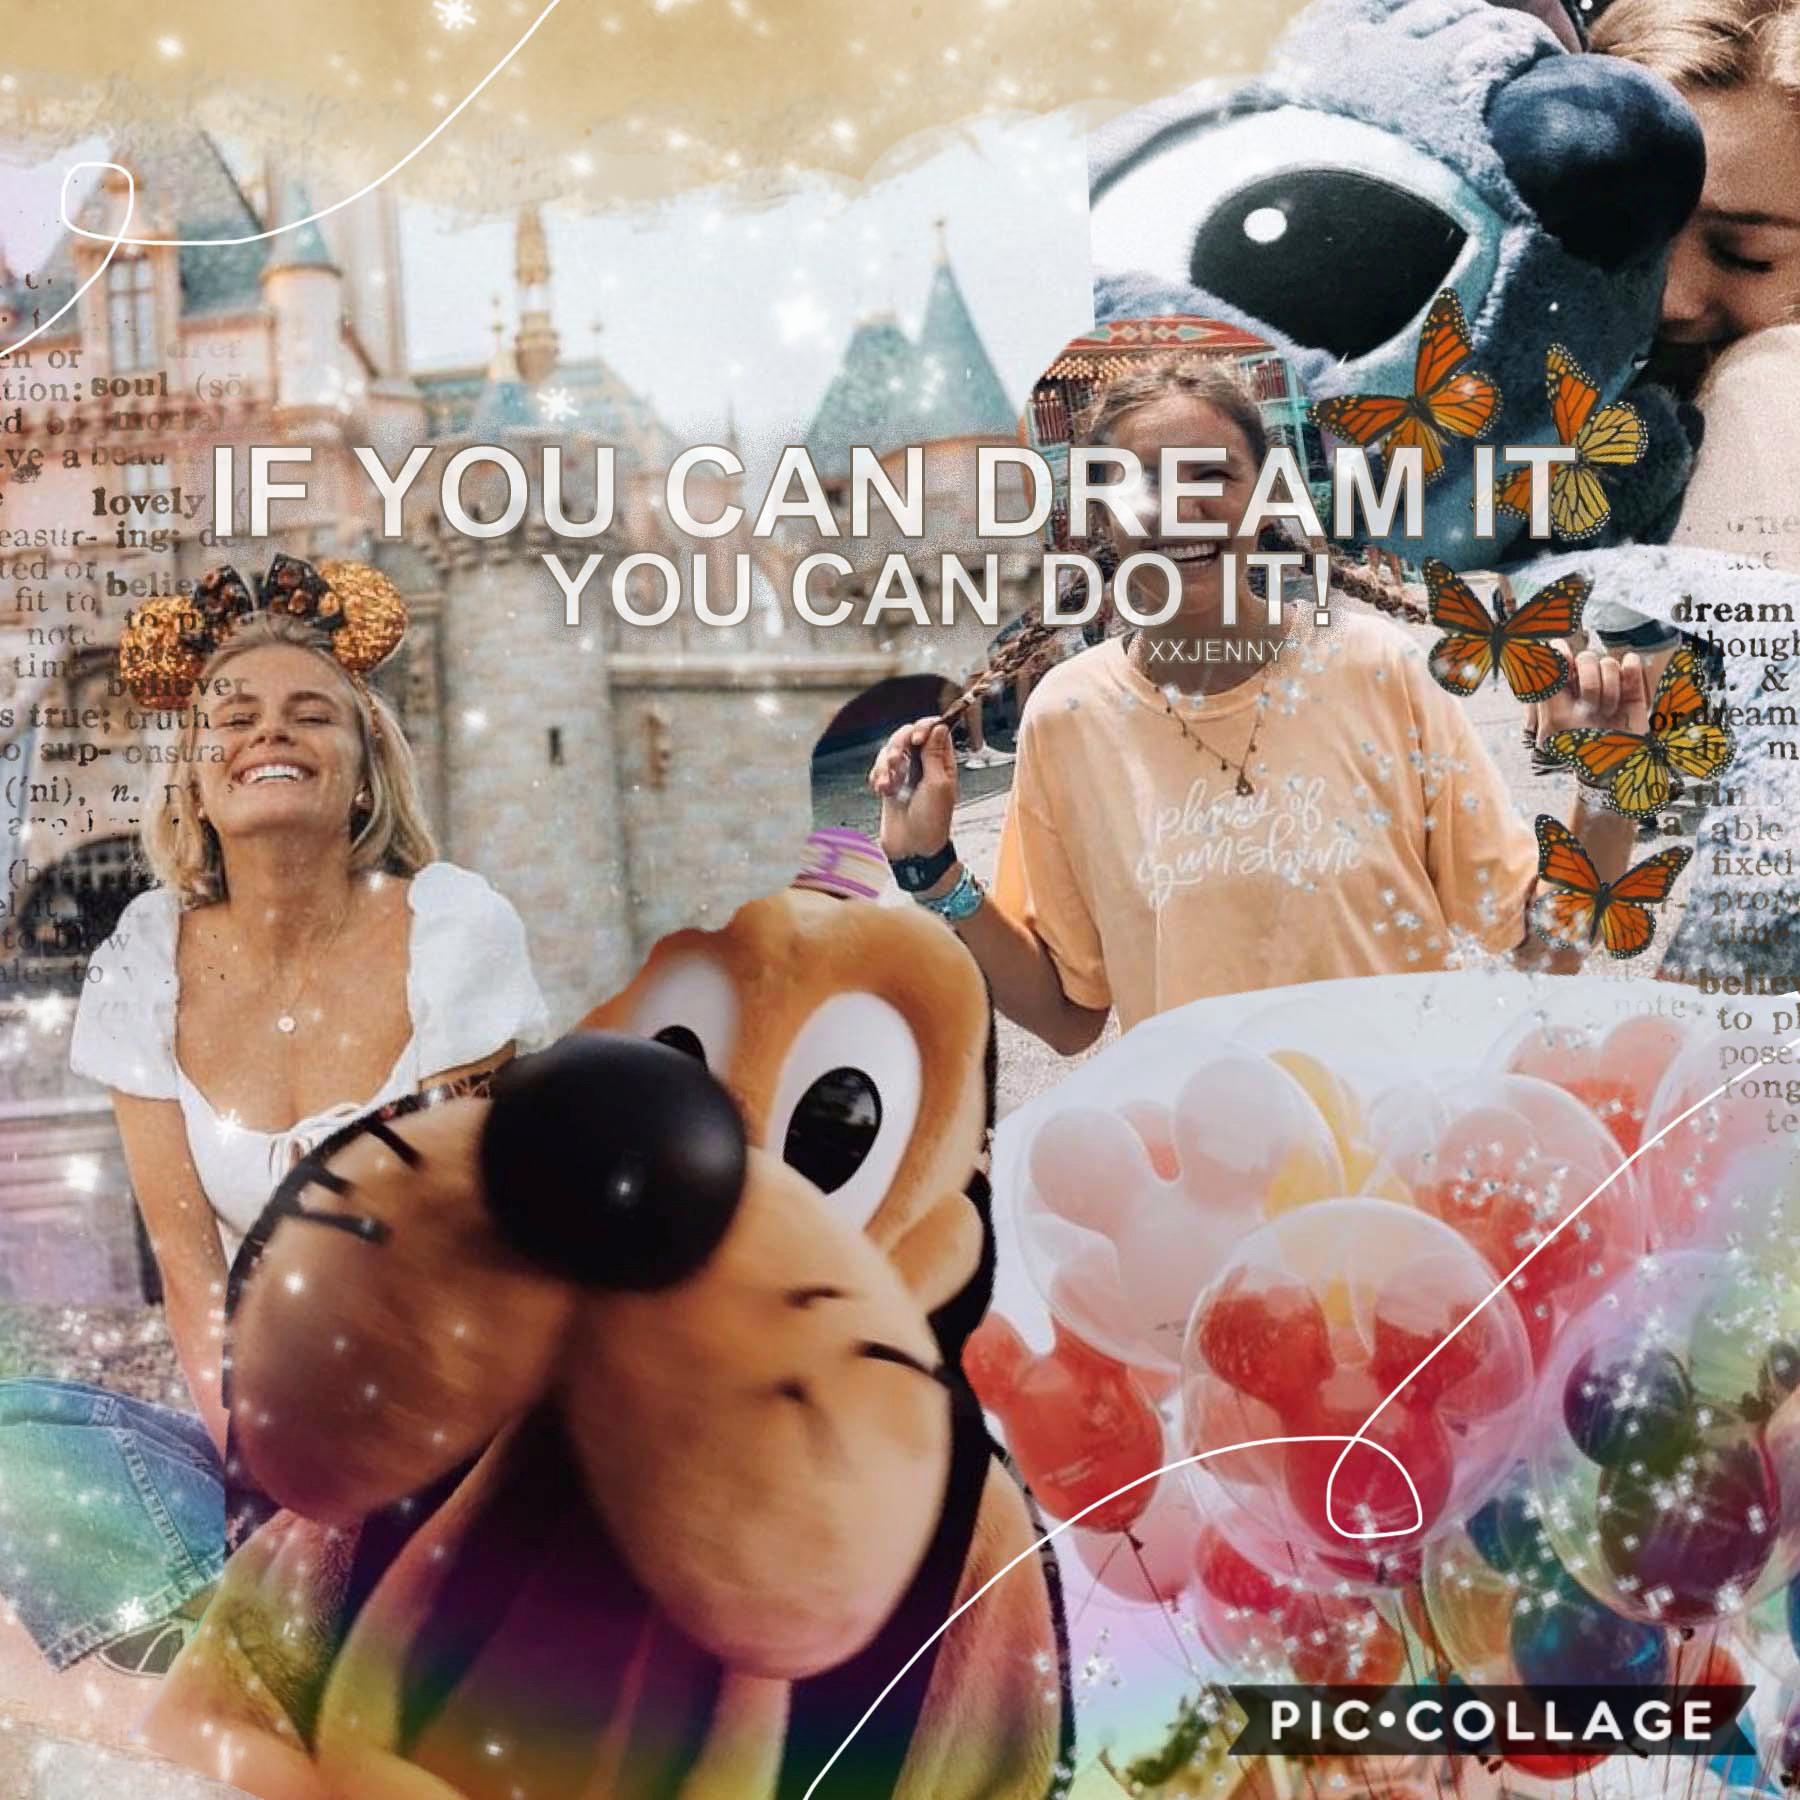 Hee guys hope you like this disney inspired collage!! I like how happy it looks! Qotd: fav disney movie? Aotd: the aristocats 😍